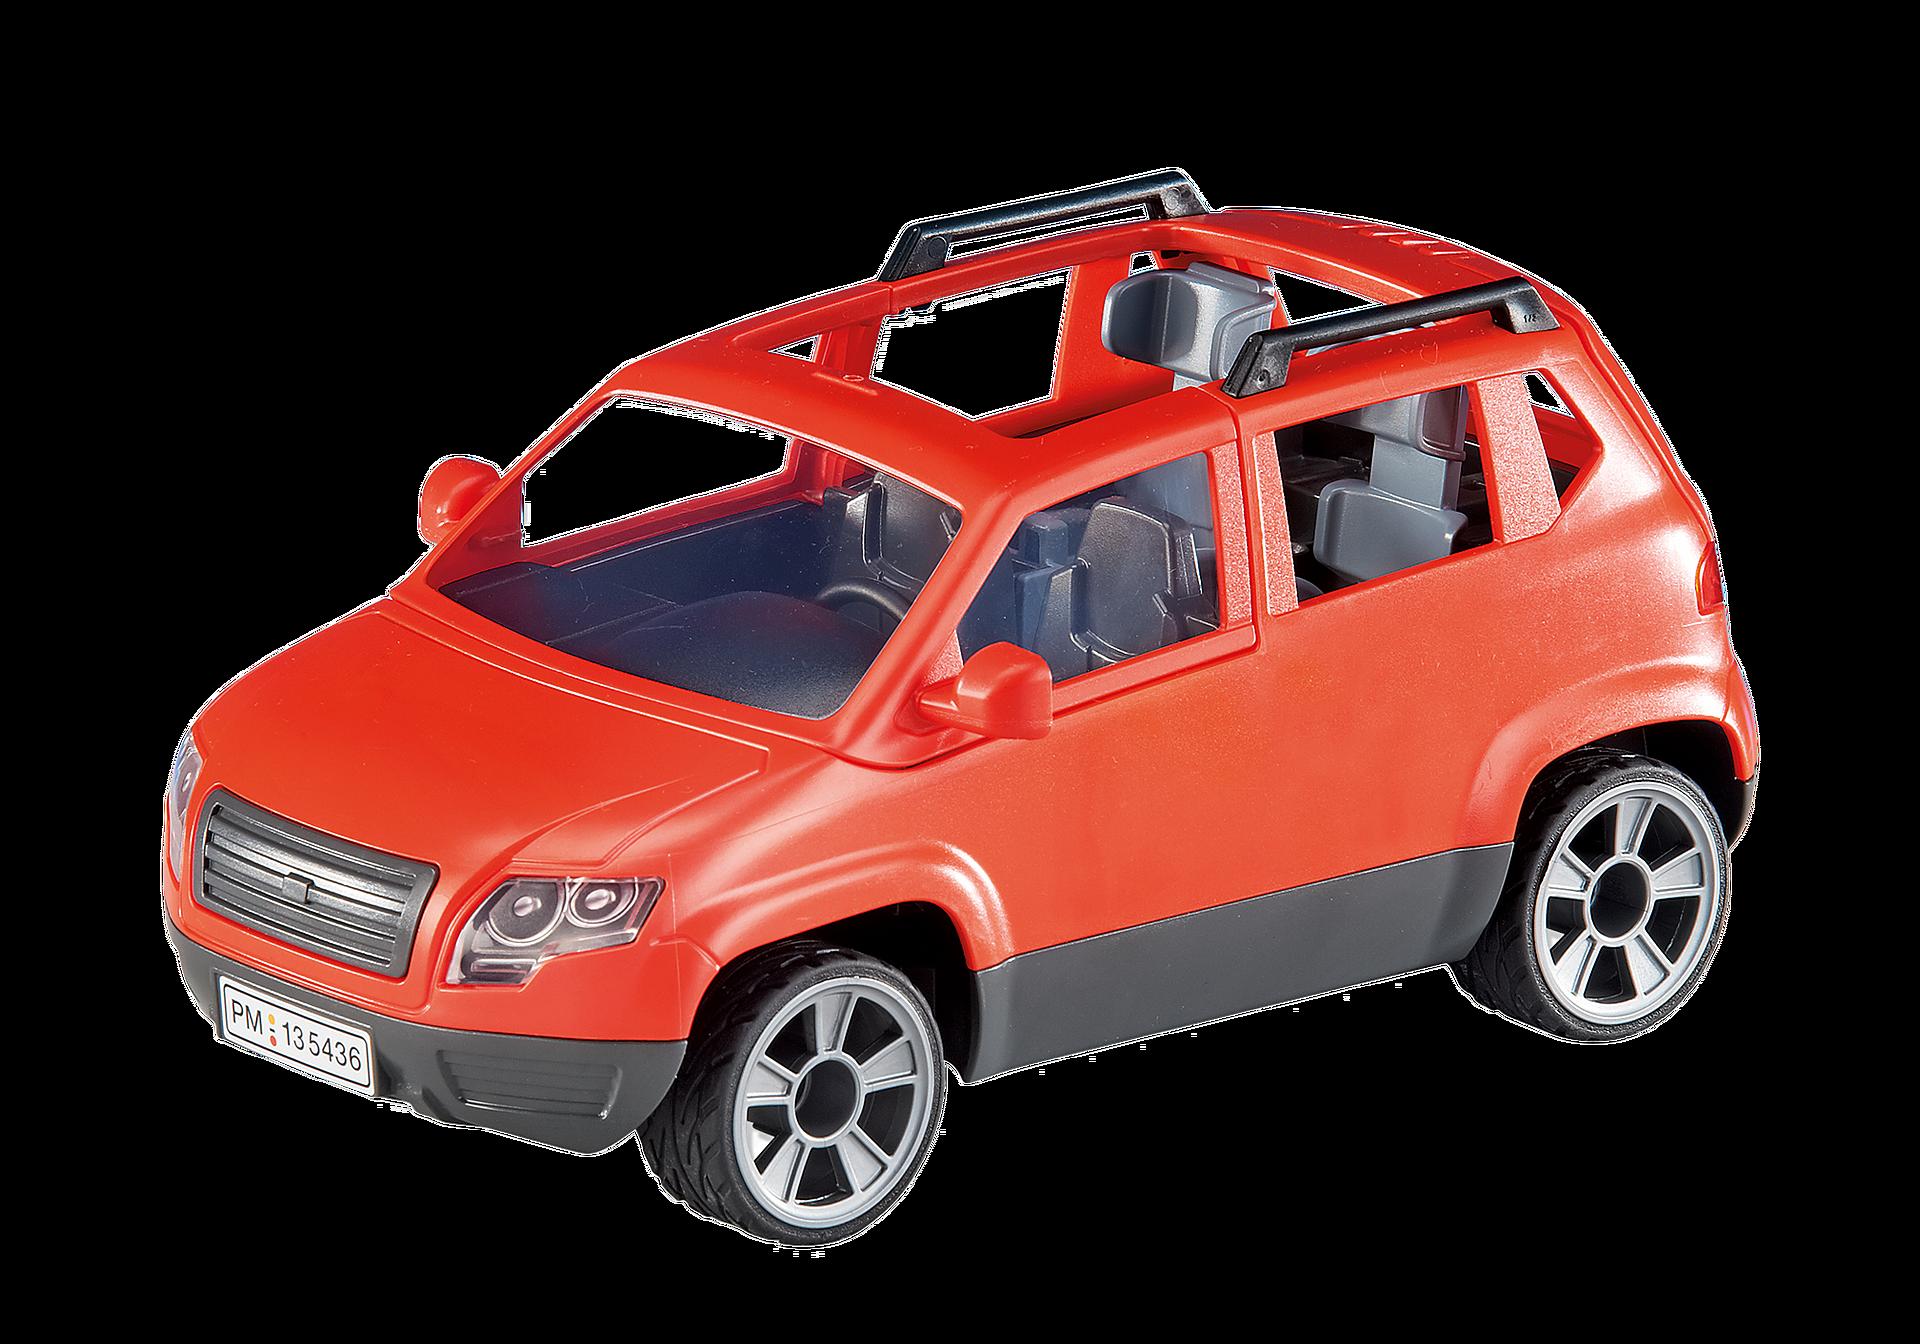 http://media.playmobil.com/i/playmobil/6507_product_detail/Familienauto